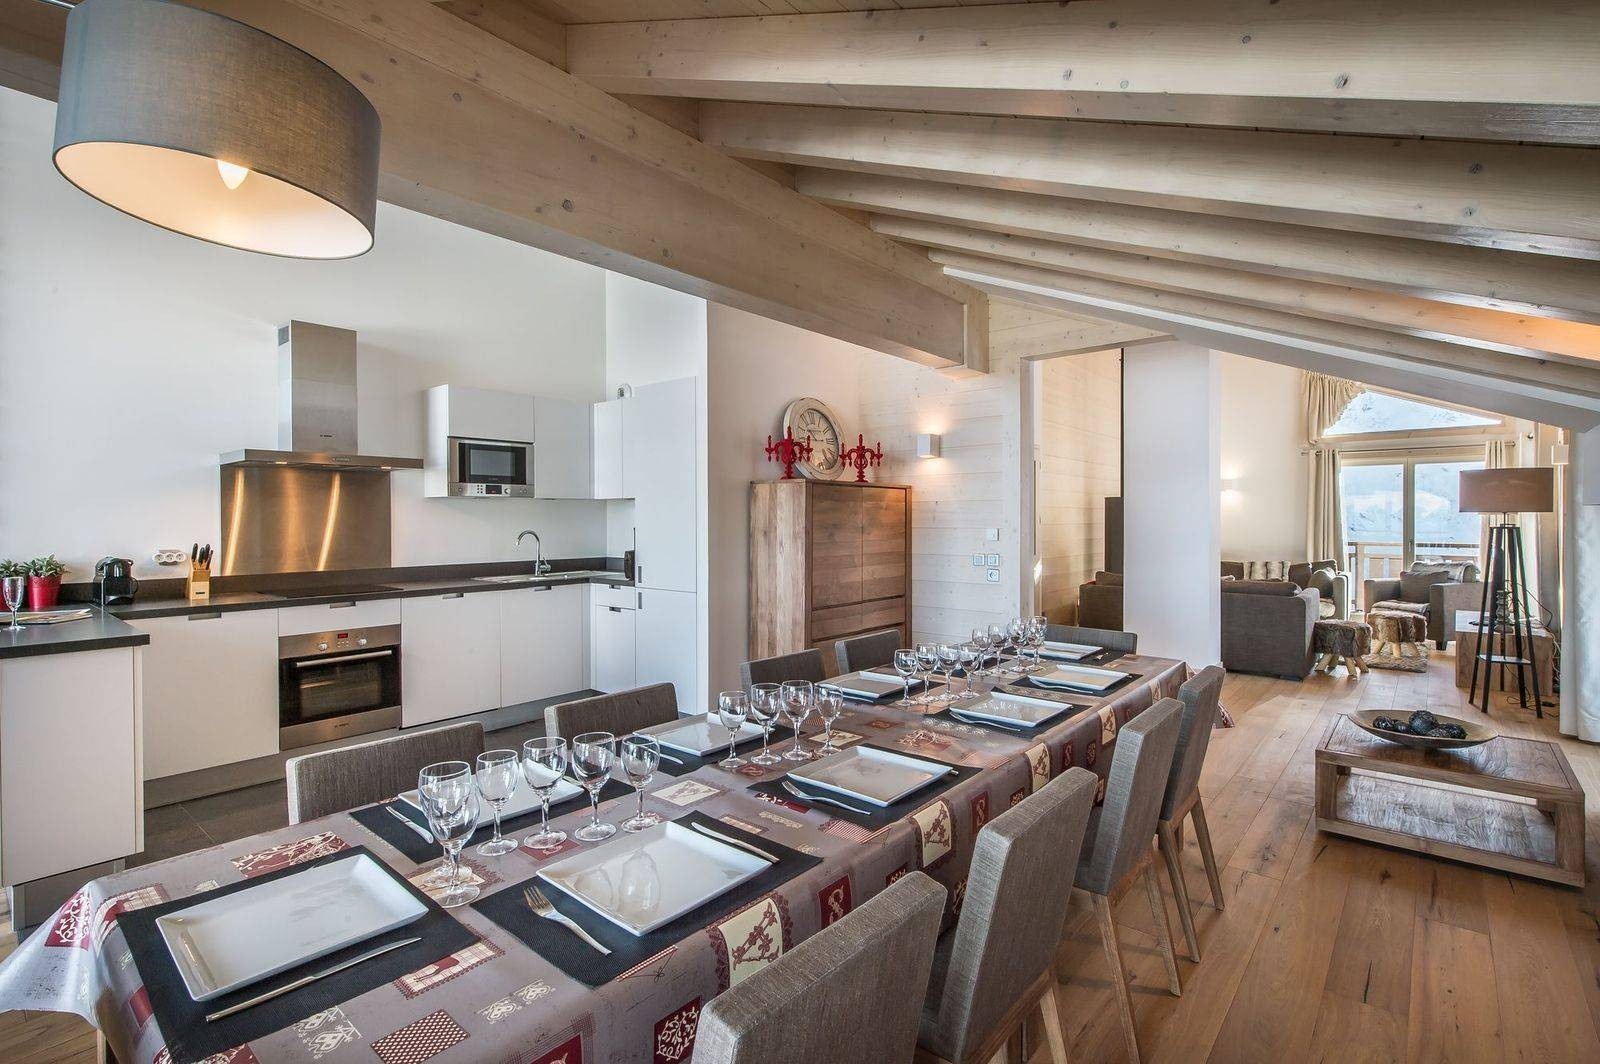 Courchevel 1650 Location Appartement Luxe Tengerite Salle A Manger 3